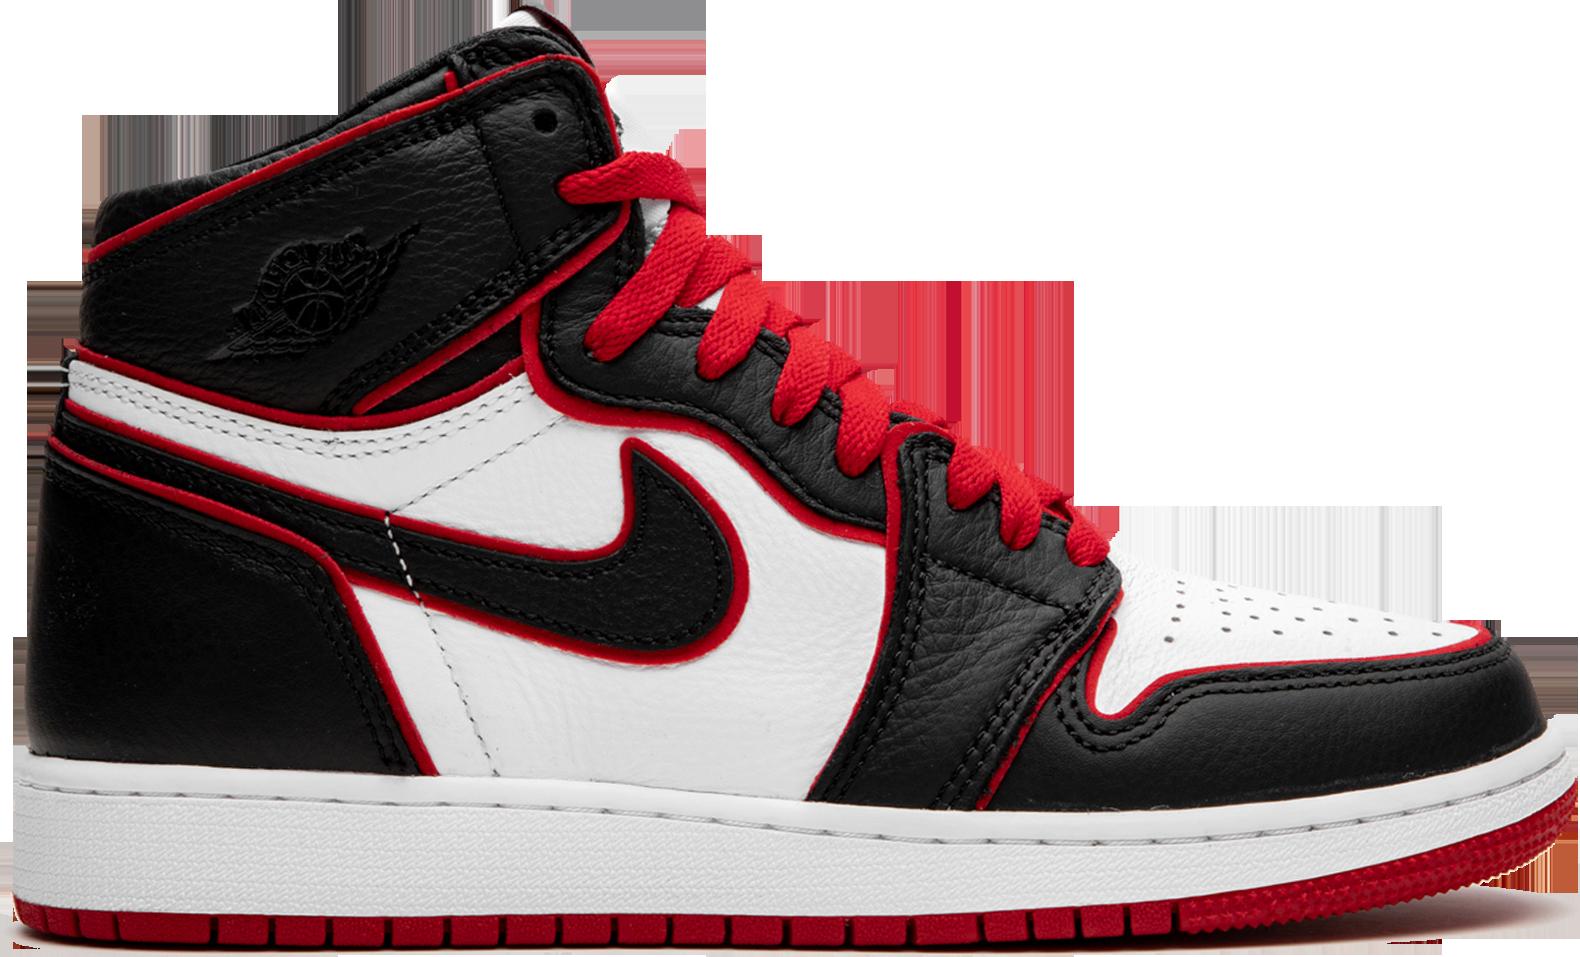 Jordan 1 Retro High Bloodline (GS